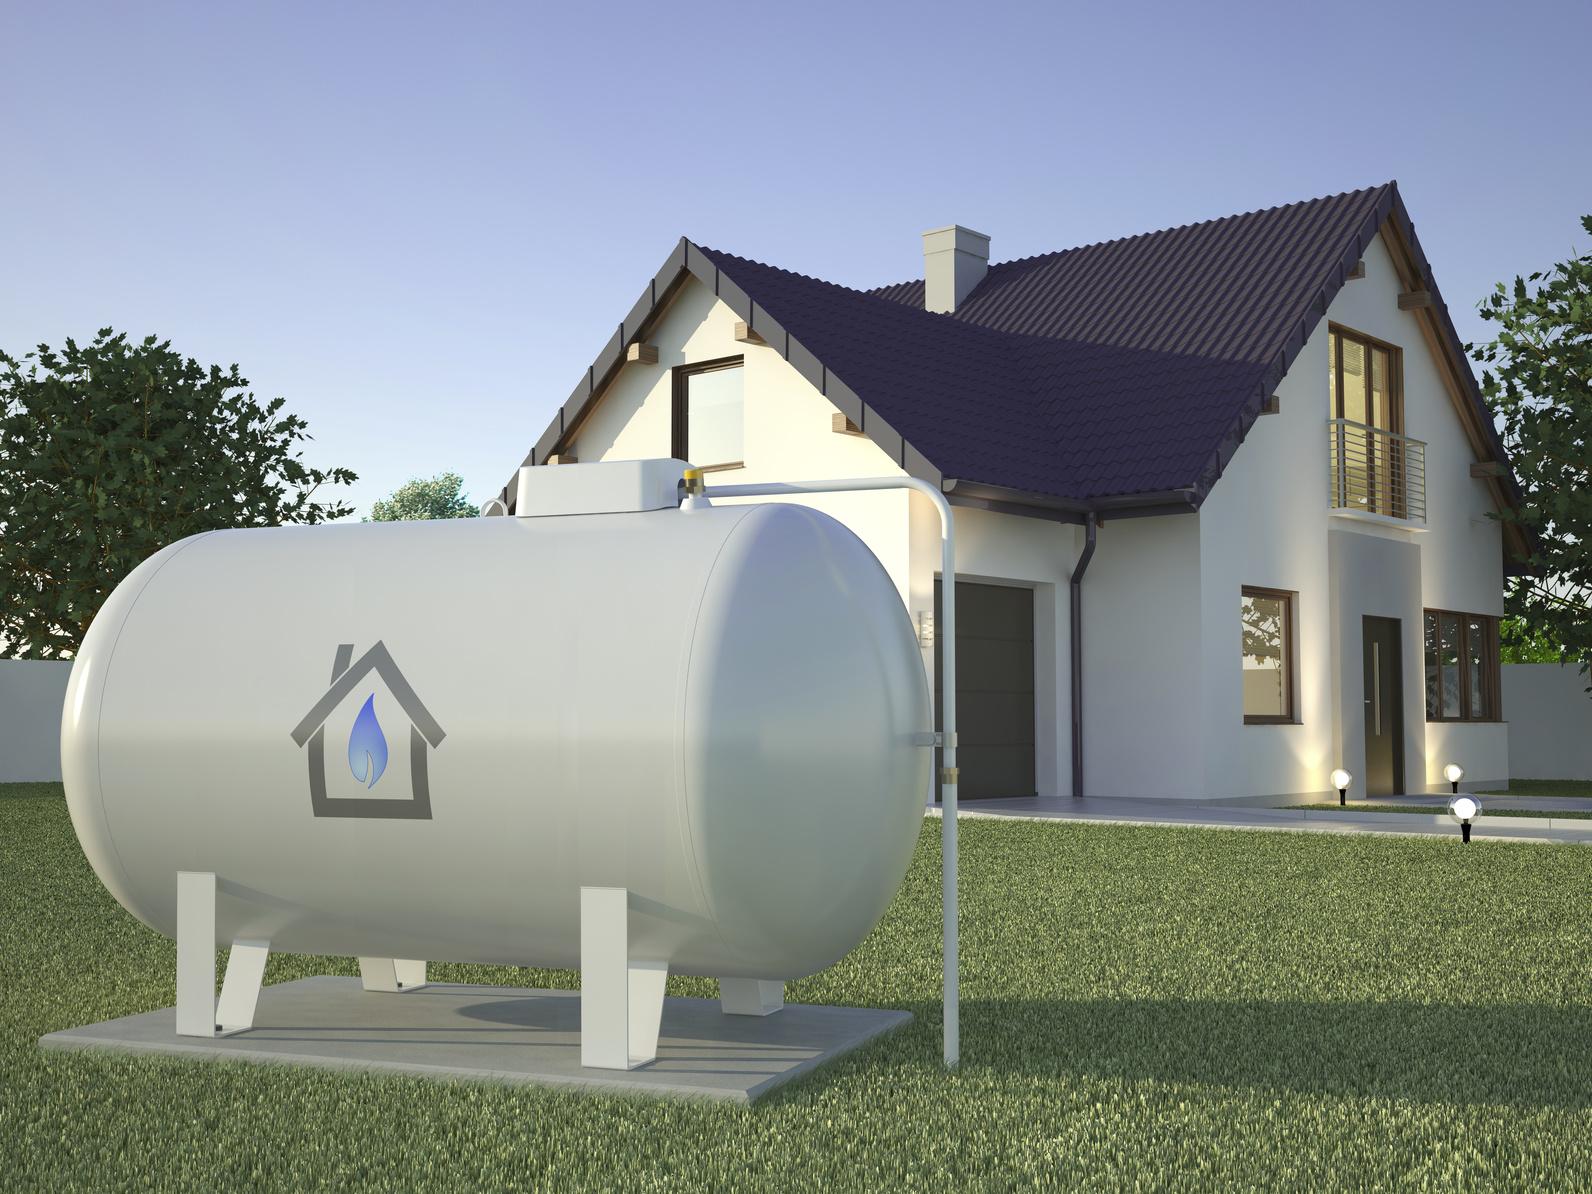 Gas Tank near house